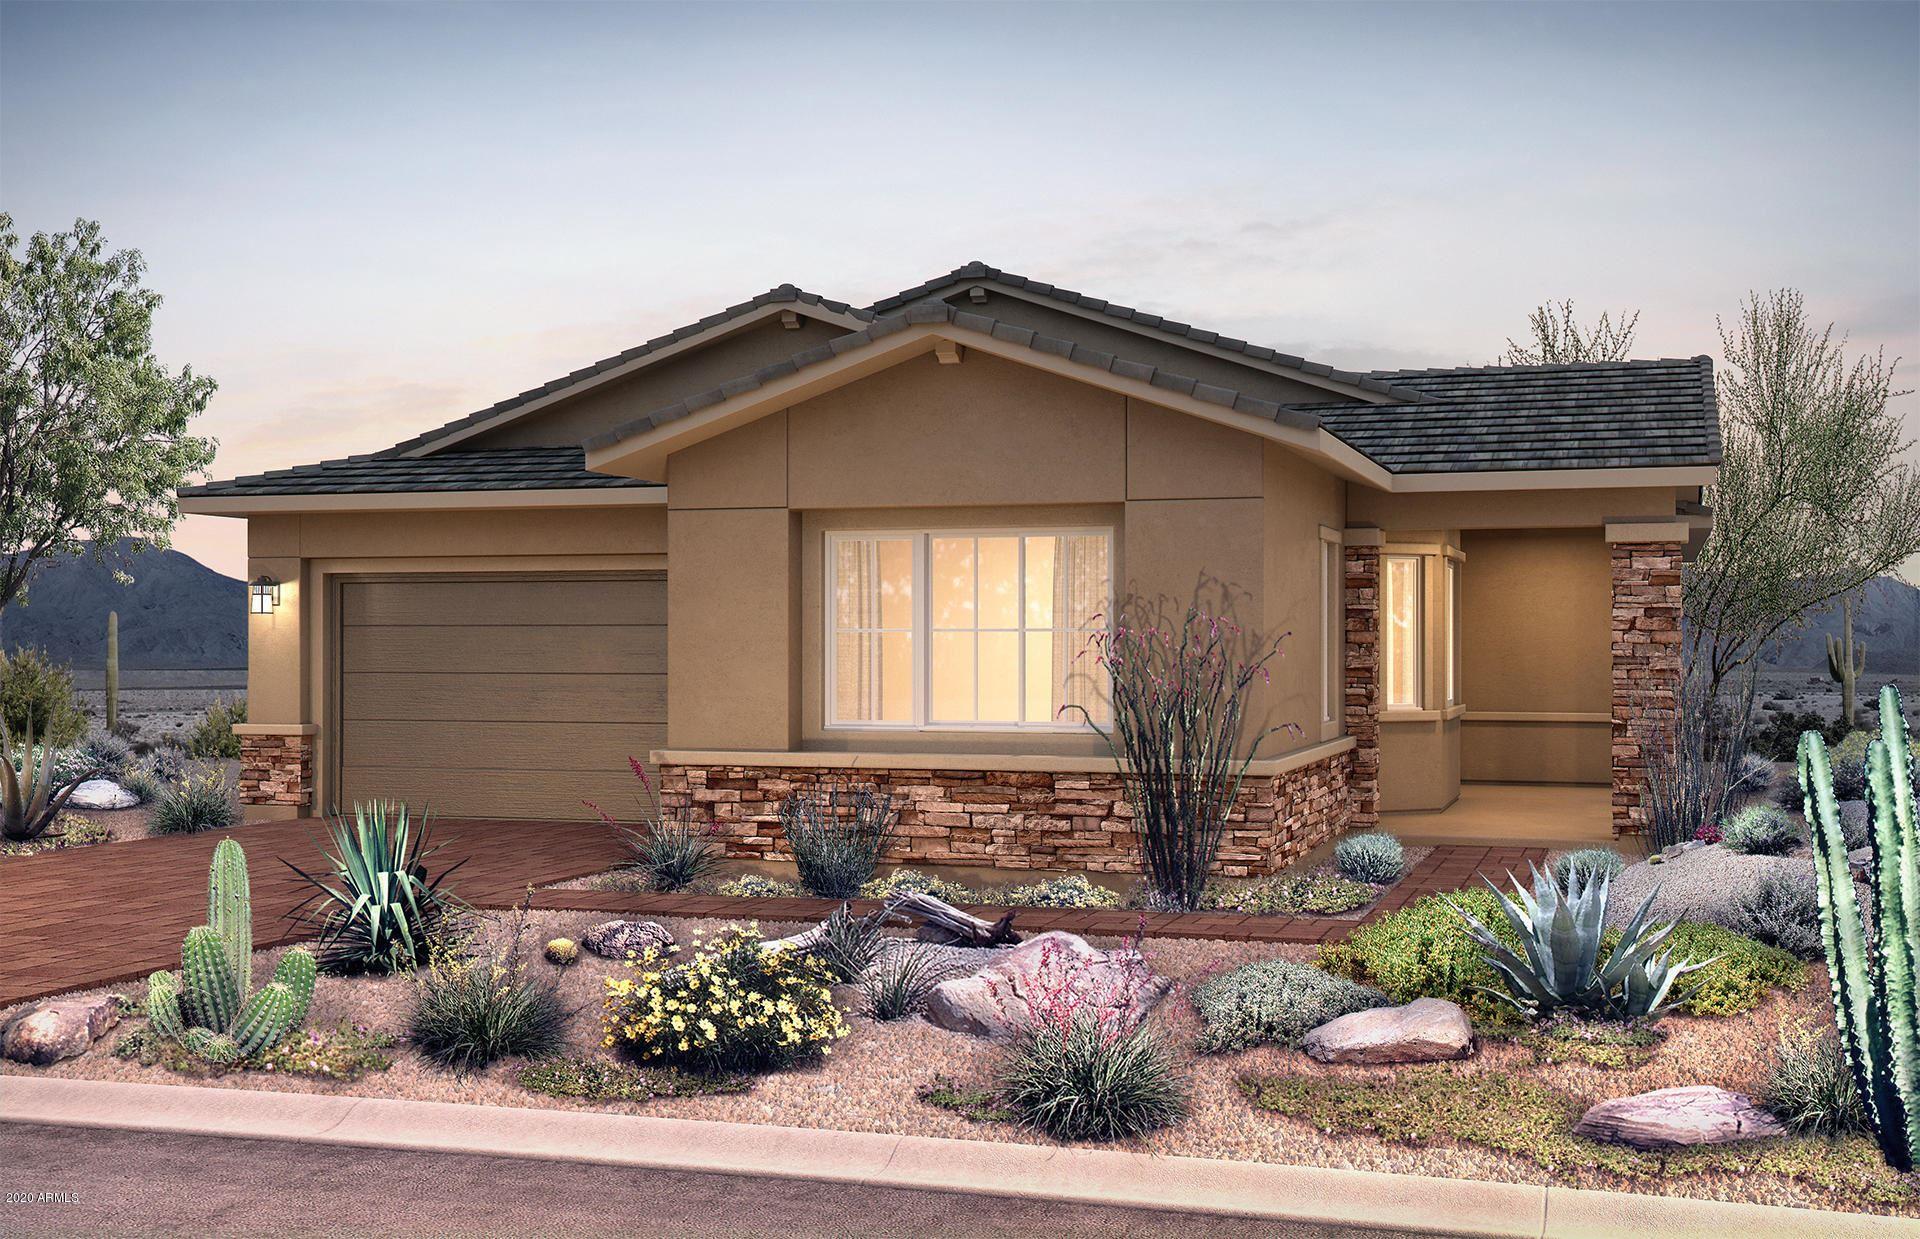 22210 N 28th Street, Phoenix, AZ 85050 - MLS#: 6040325